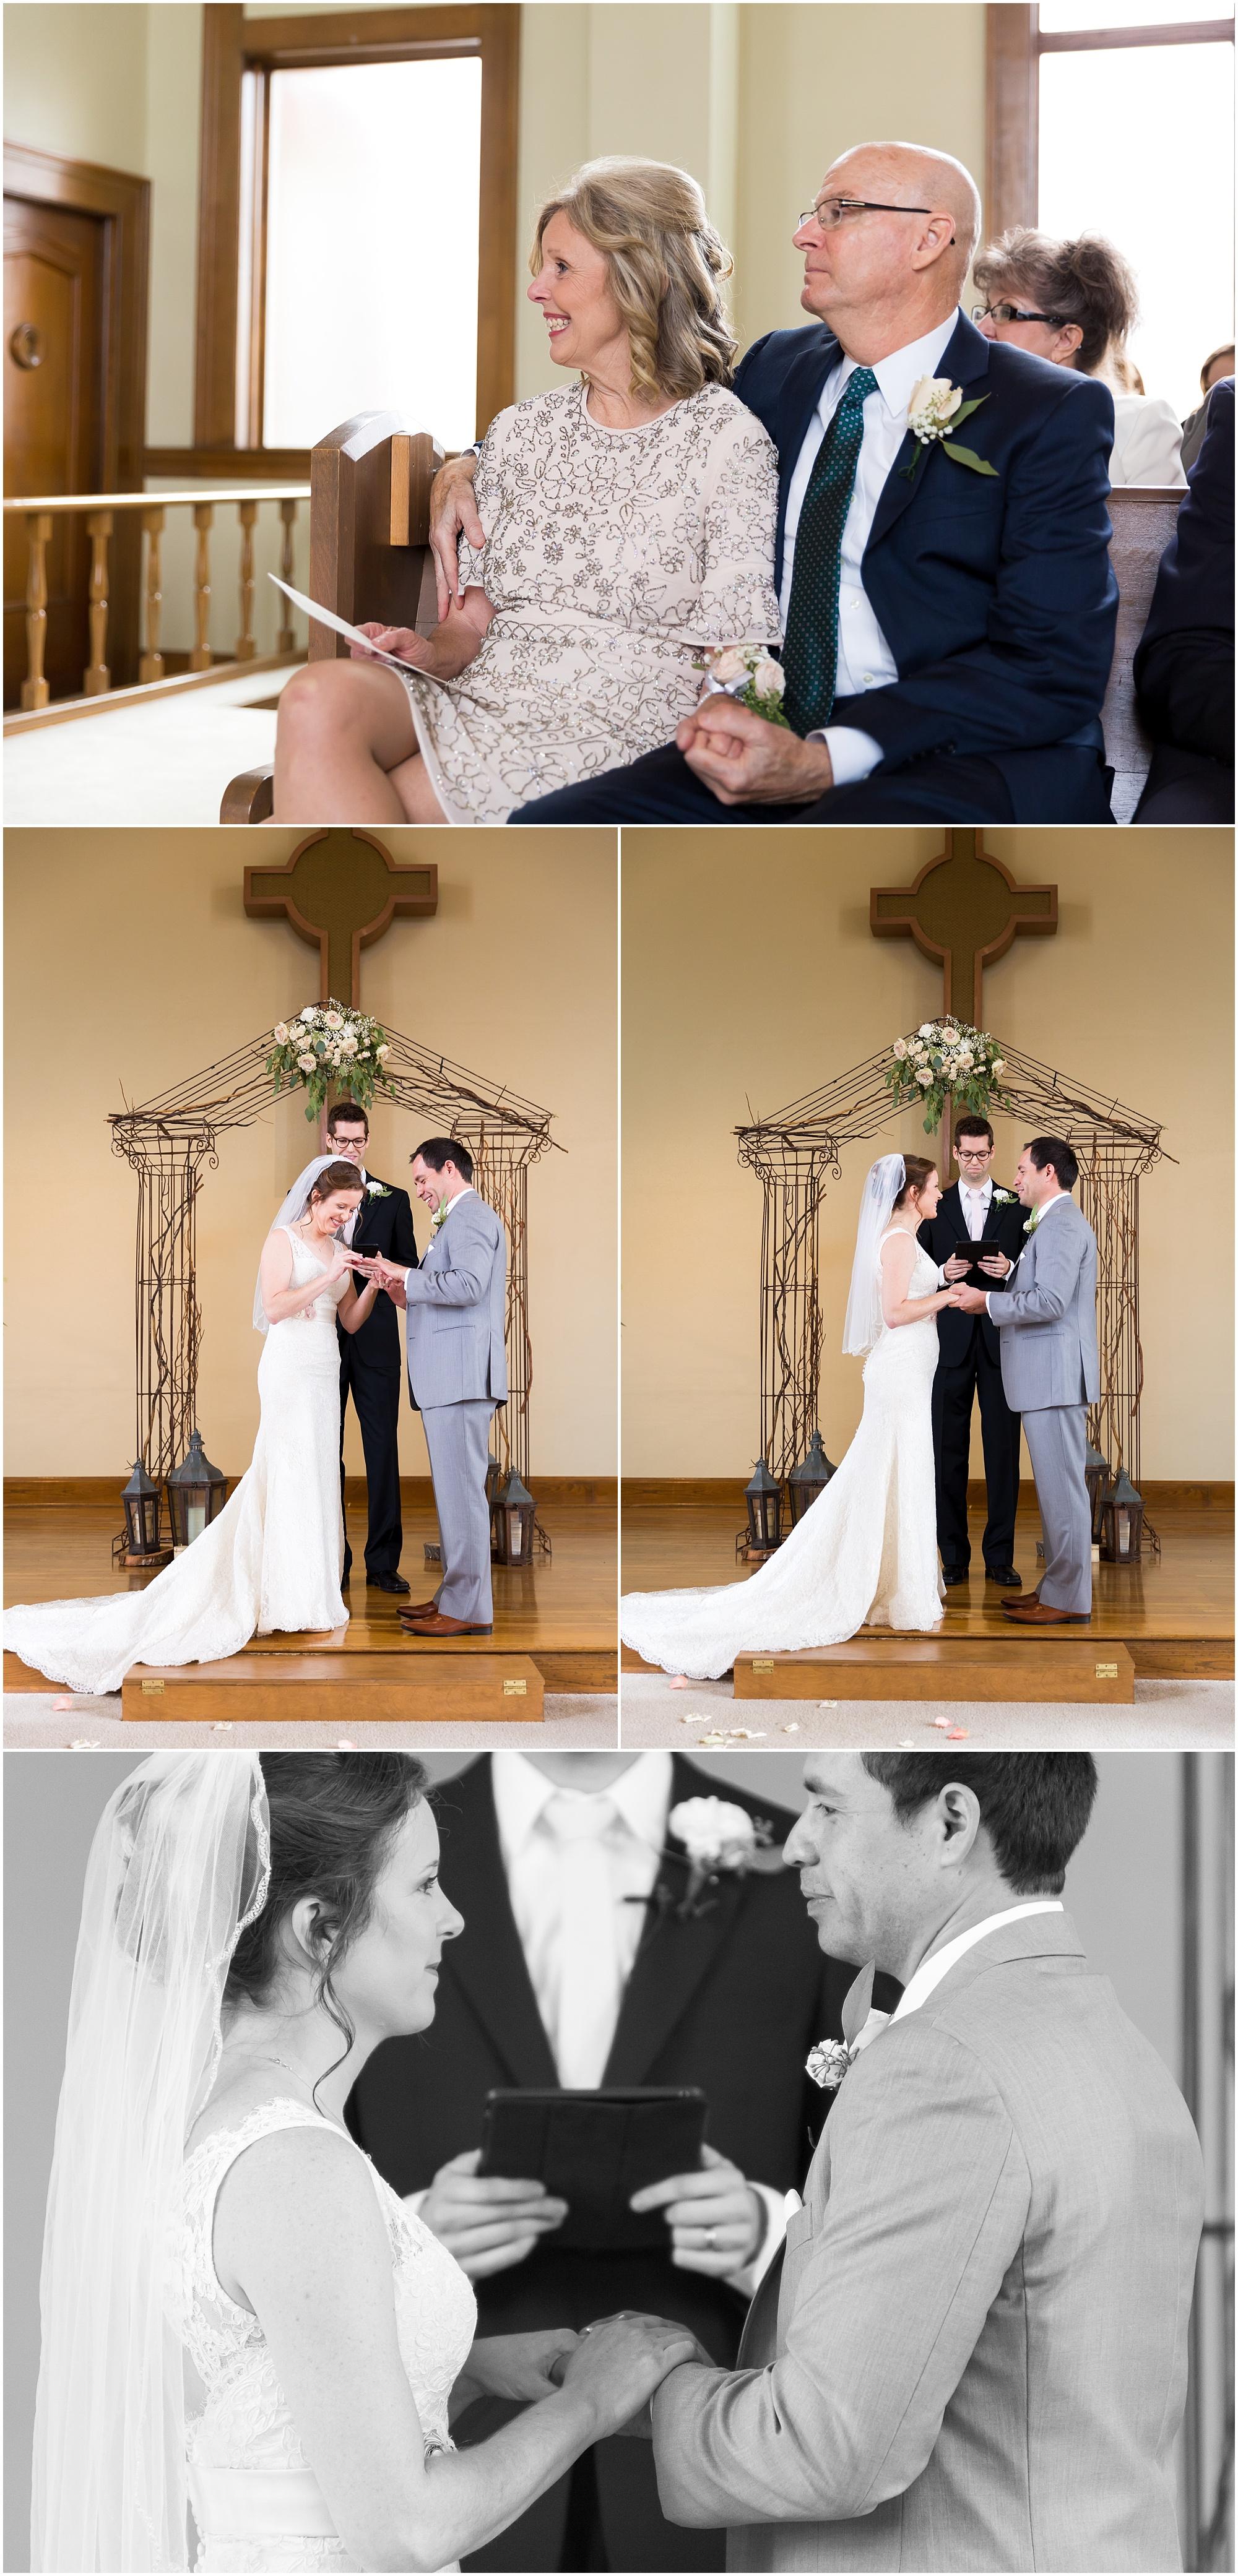 Downtown-Waco-Fall-Wedding_0016.jpg